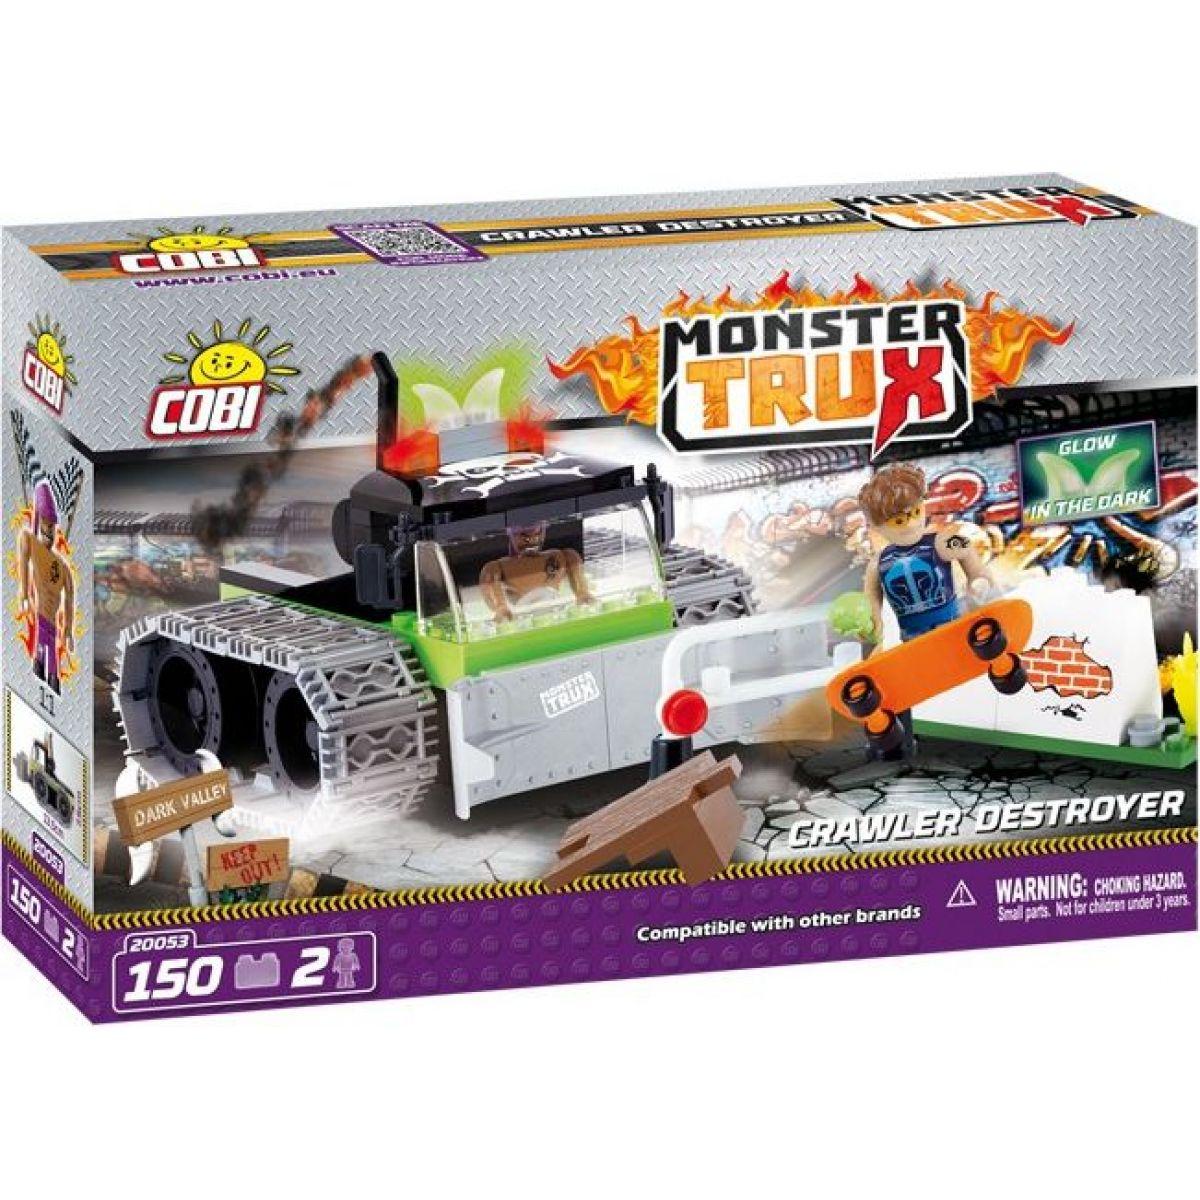 Cobi Monster Trux 20053 Crawler Destroyer